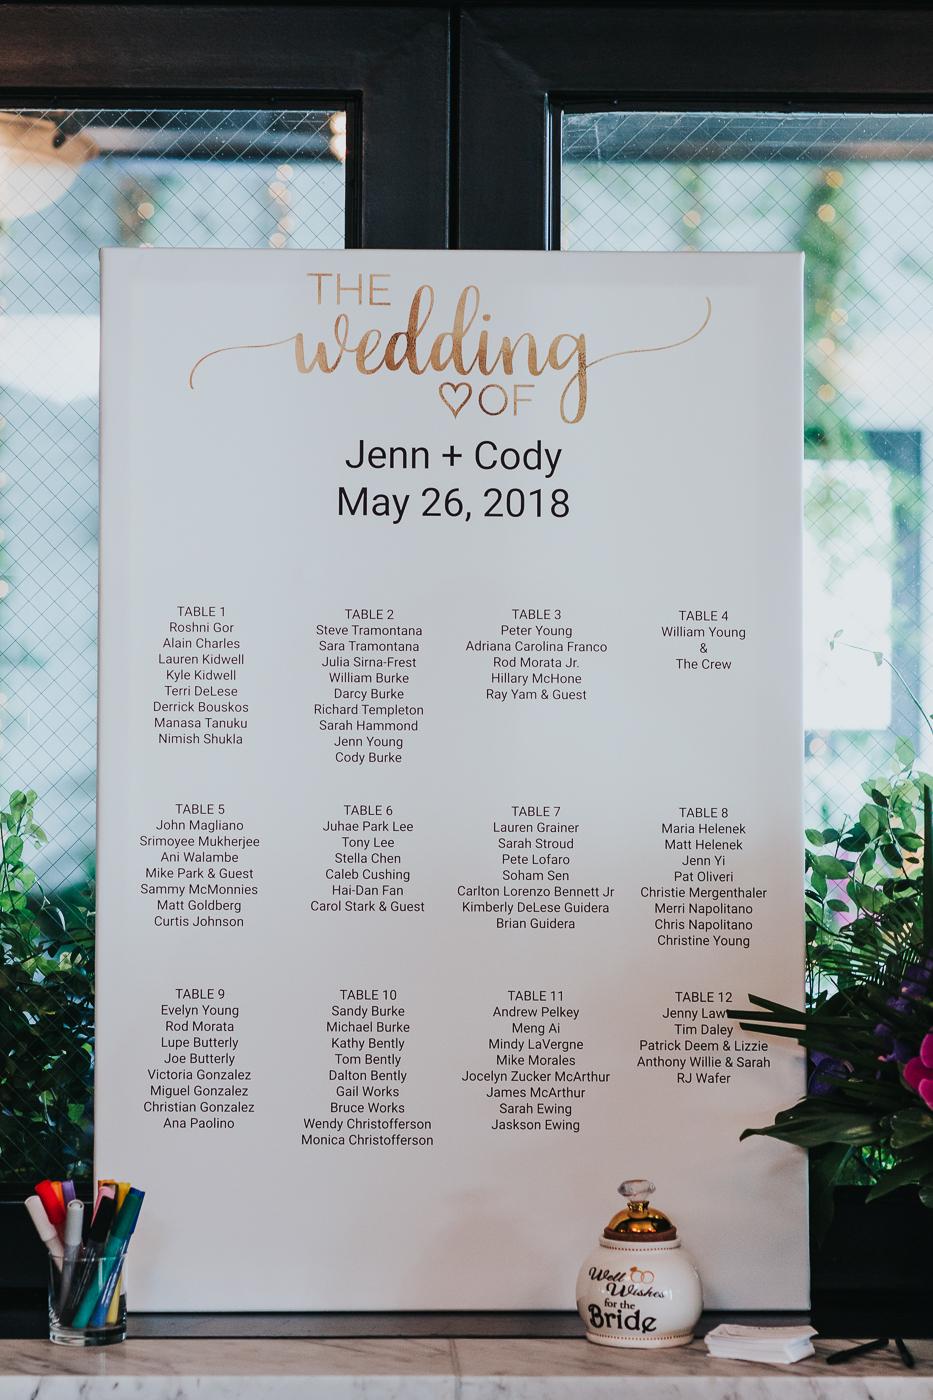 501-Union-Brooklyn-Documentary-Wedding-Photographer-55.jpg